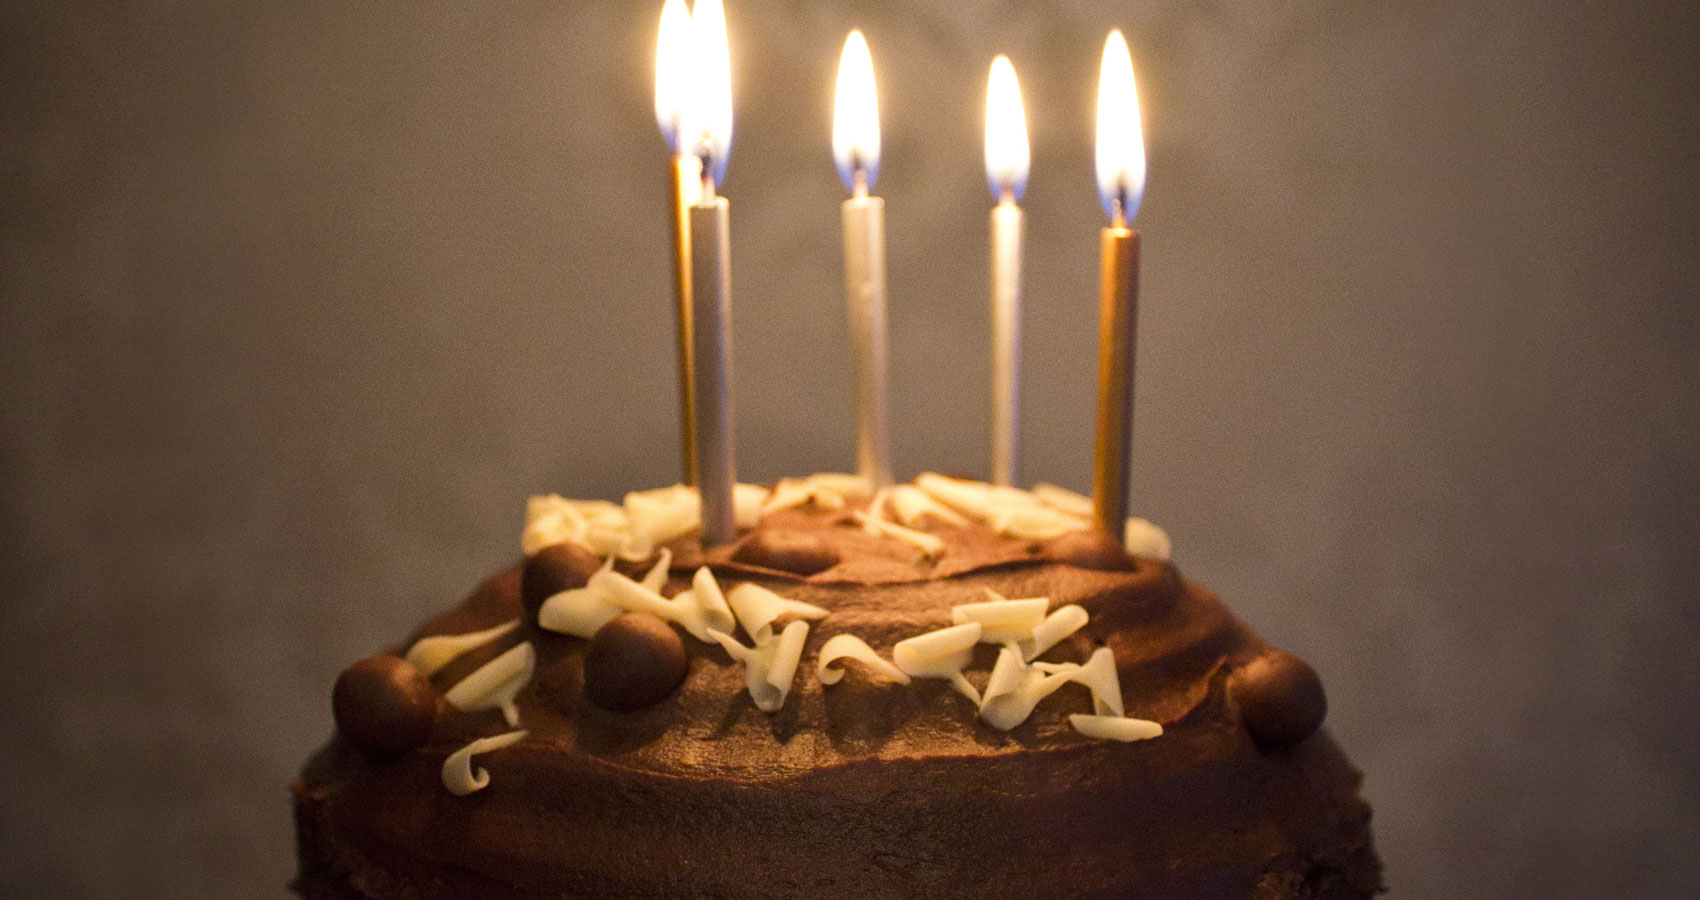 On My Birthday, flash fiction written by Elke Margaretta at Spillwords.com